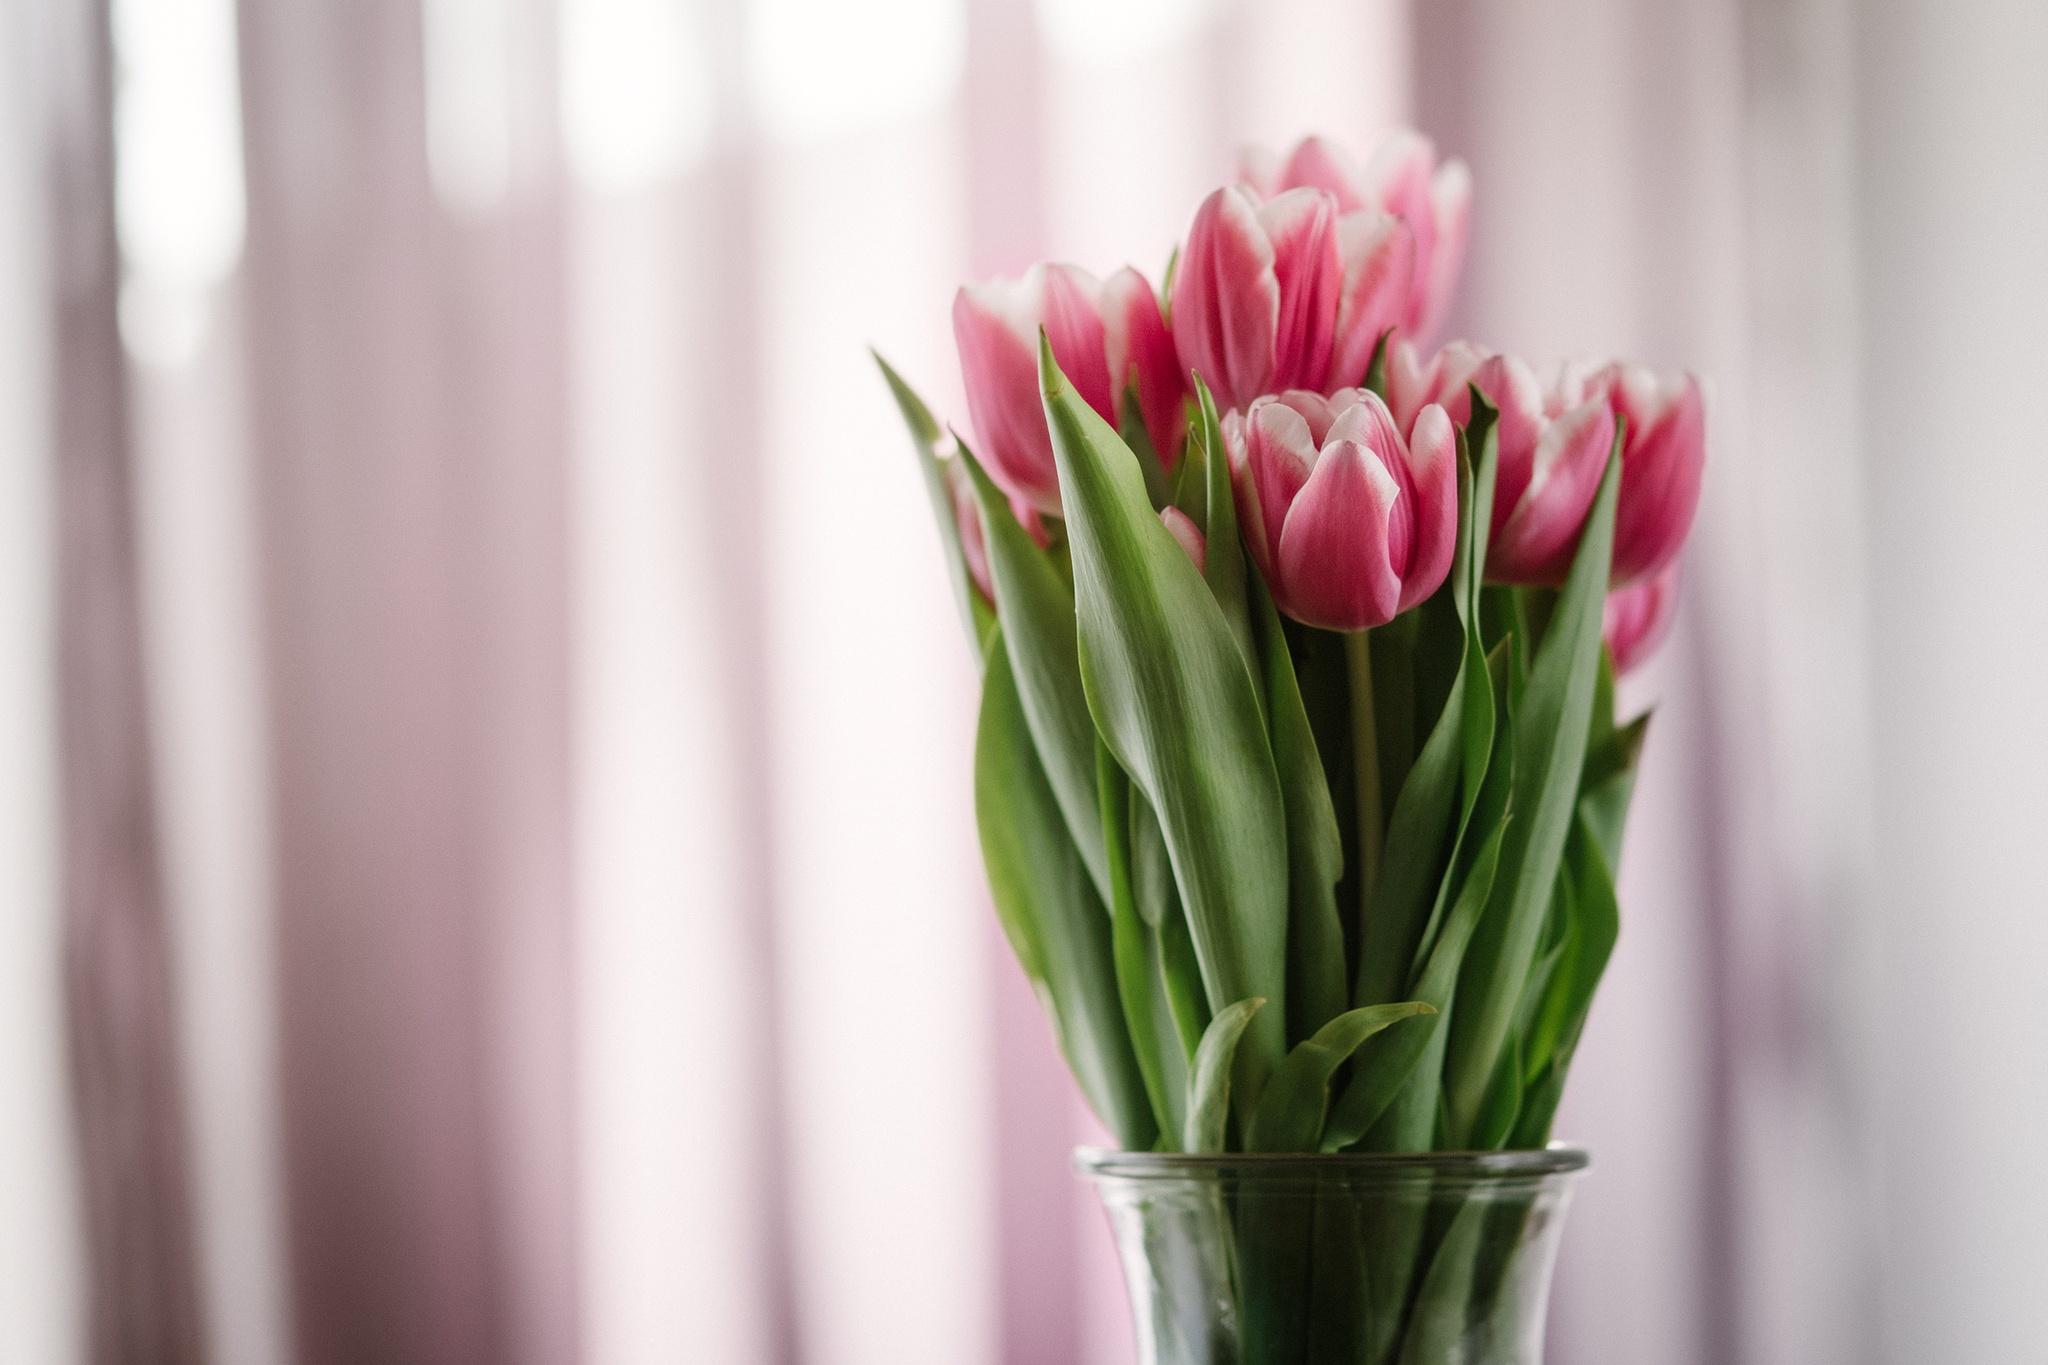 tulips in glass by Angela Zaugg